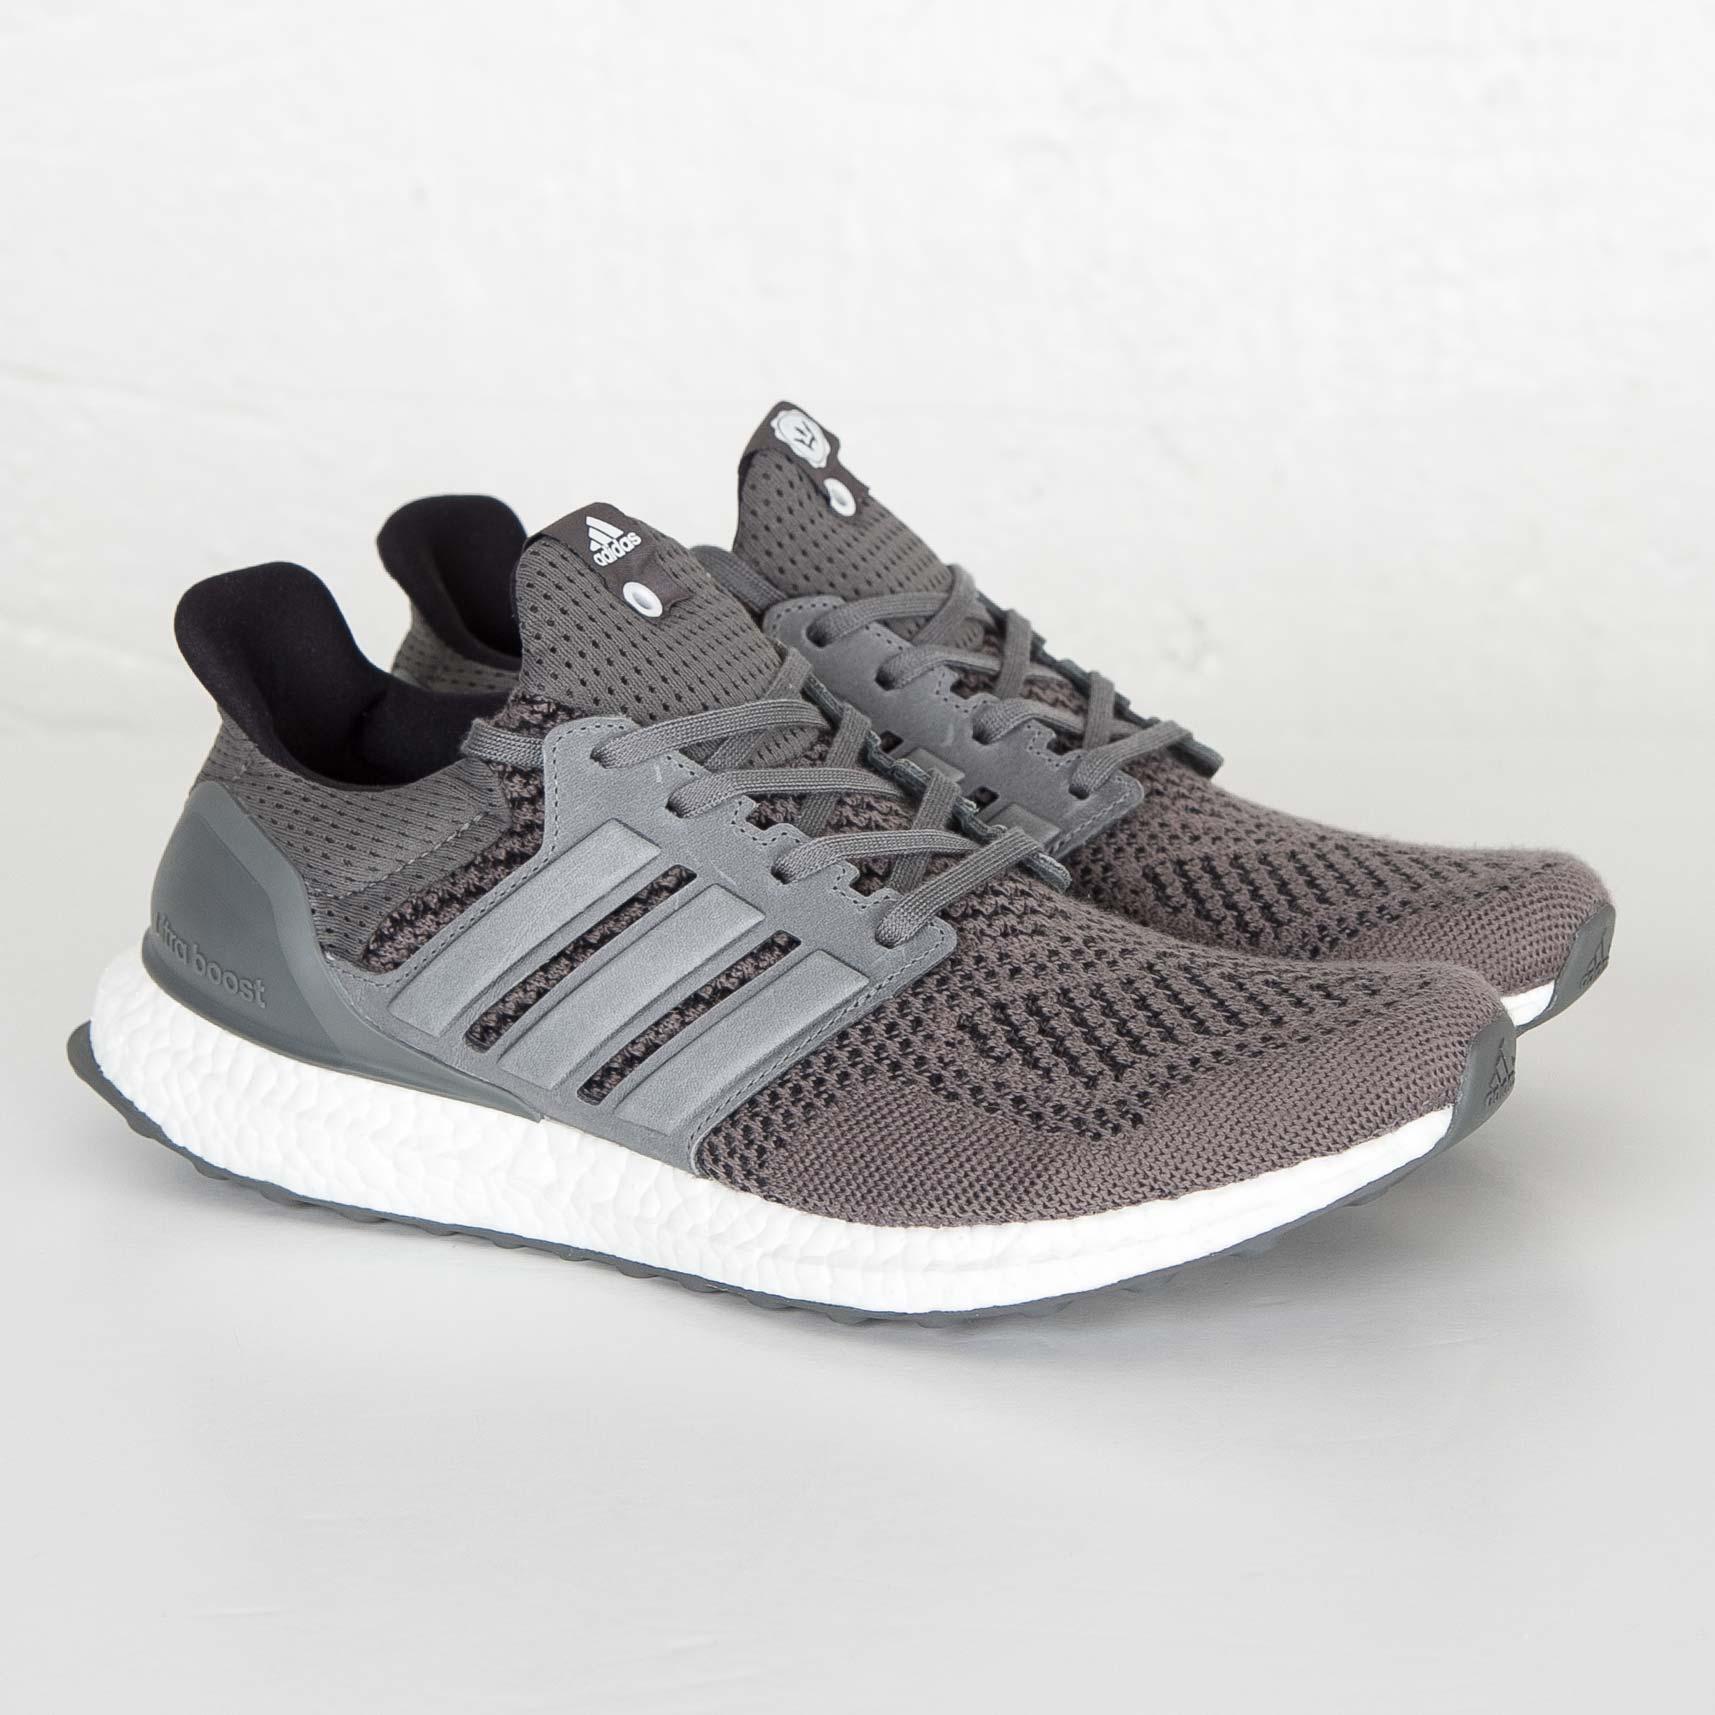 954073d456c32 adidas Ultraboost Highsnobiety - S74879 - Sneakersnstuff